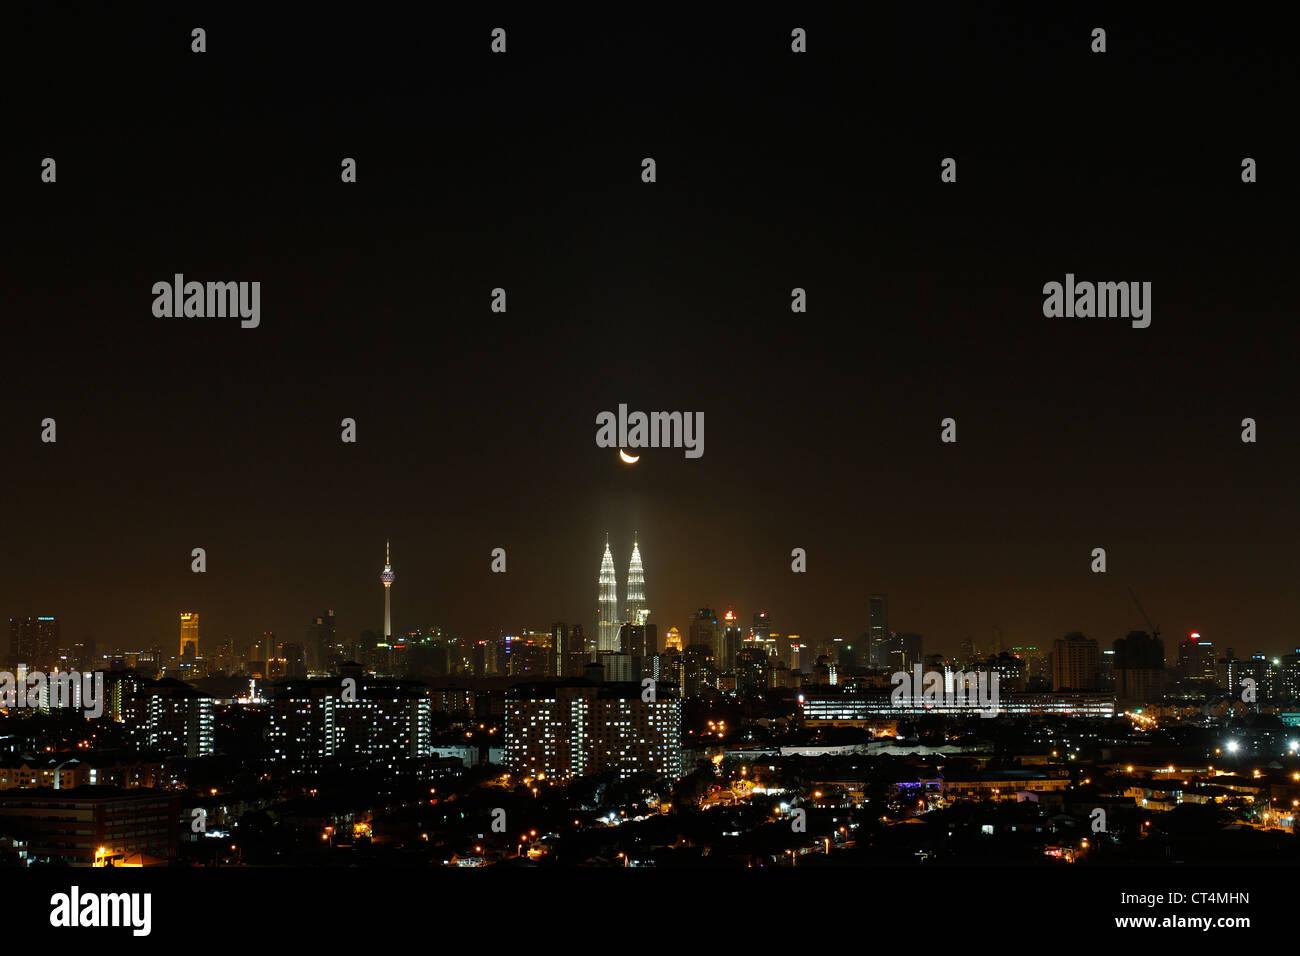 Kuala Lumpur at night, Malaysia. - Stock Image